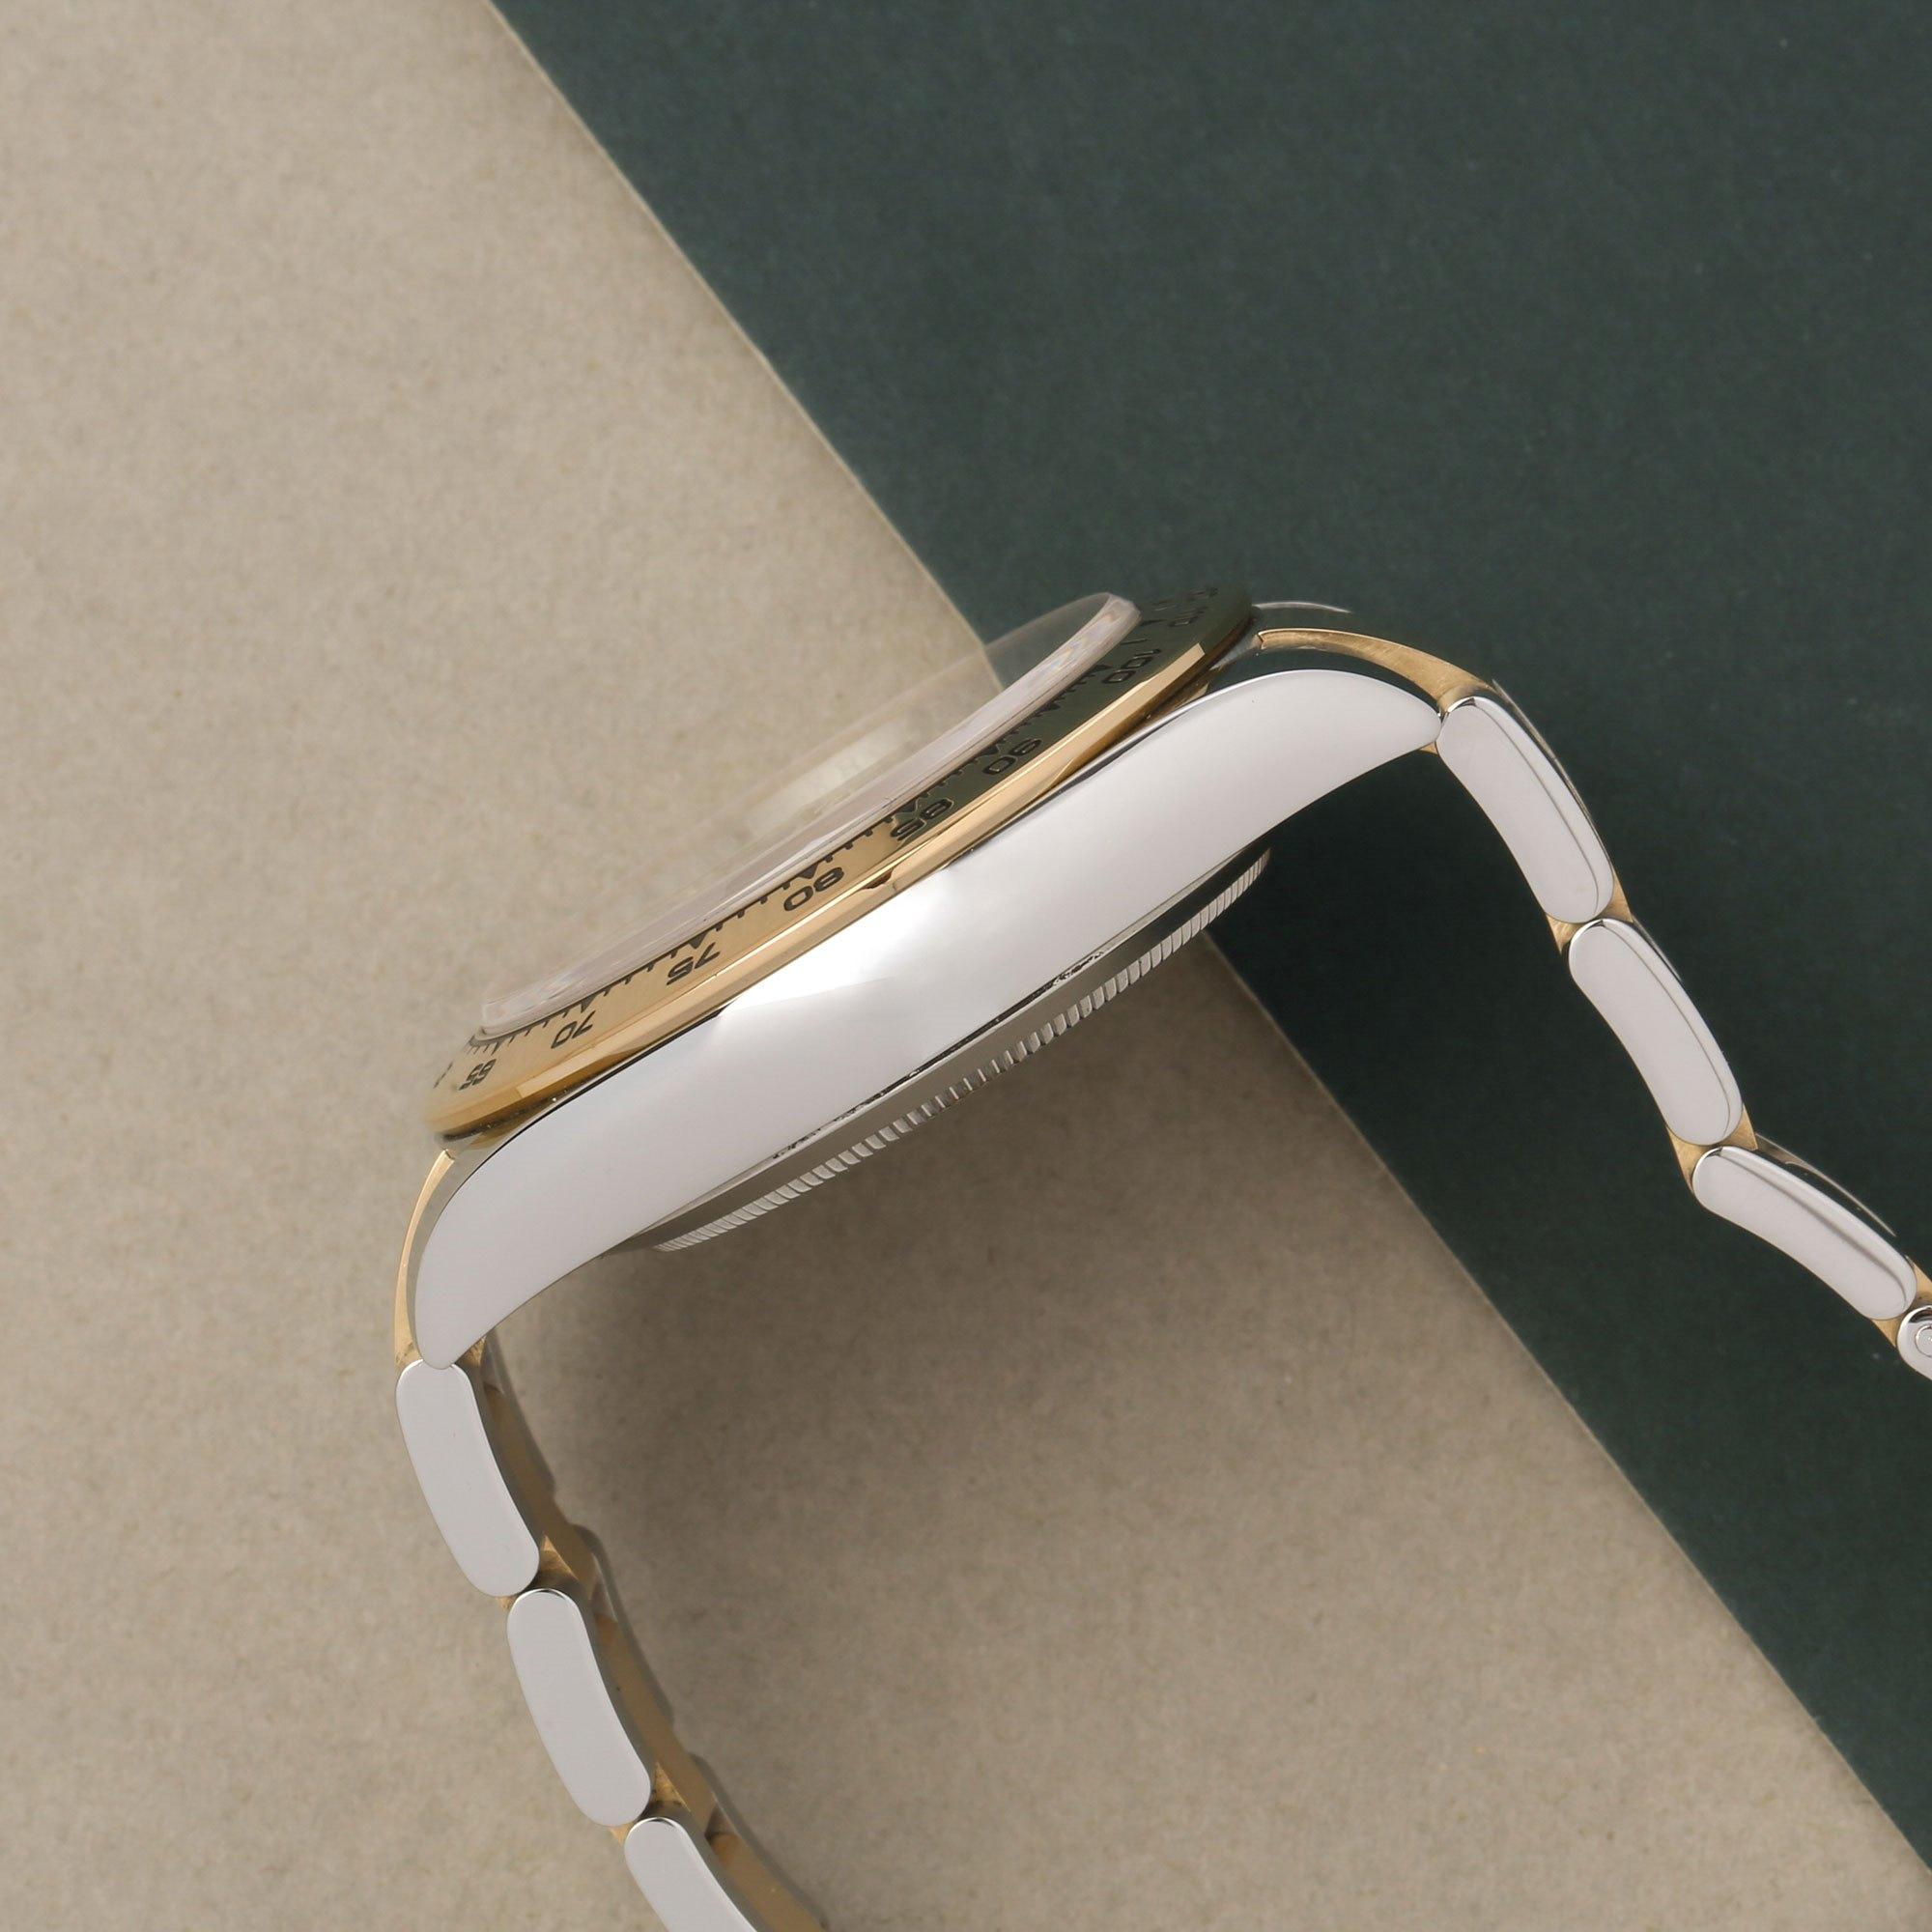 Rolex Daytona Cosmograph 18K Stainless Steel & Yellow Gold 116503